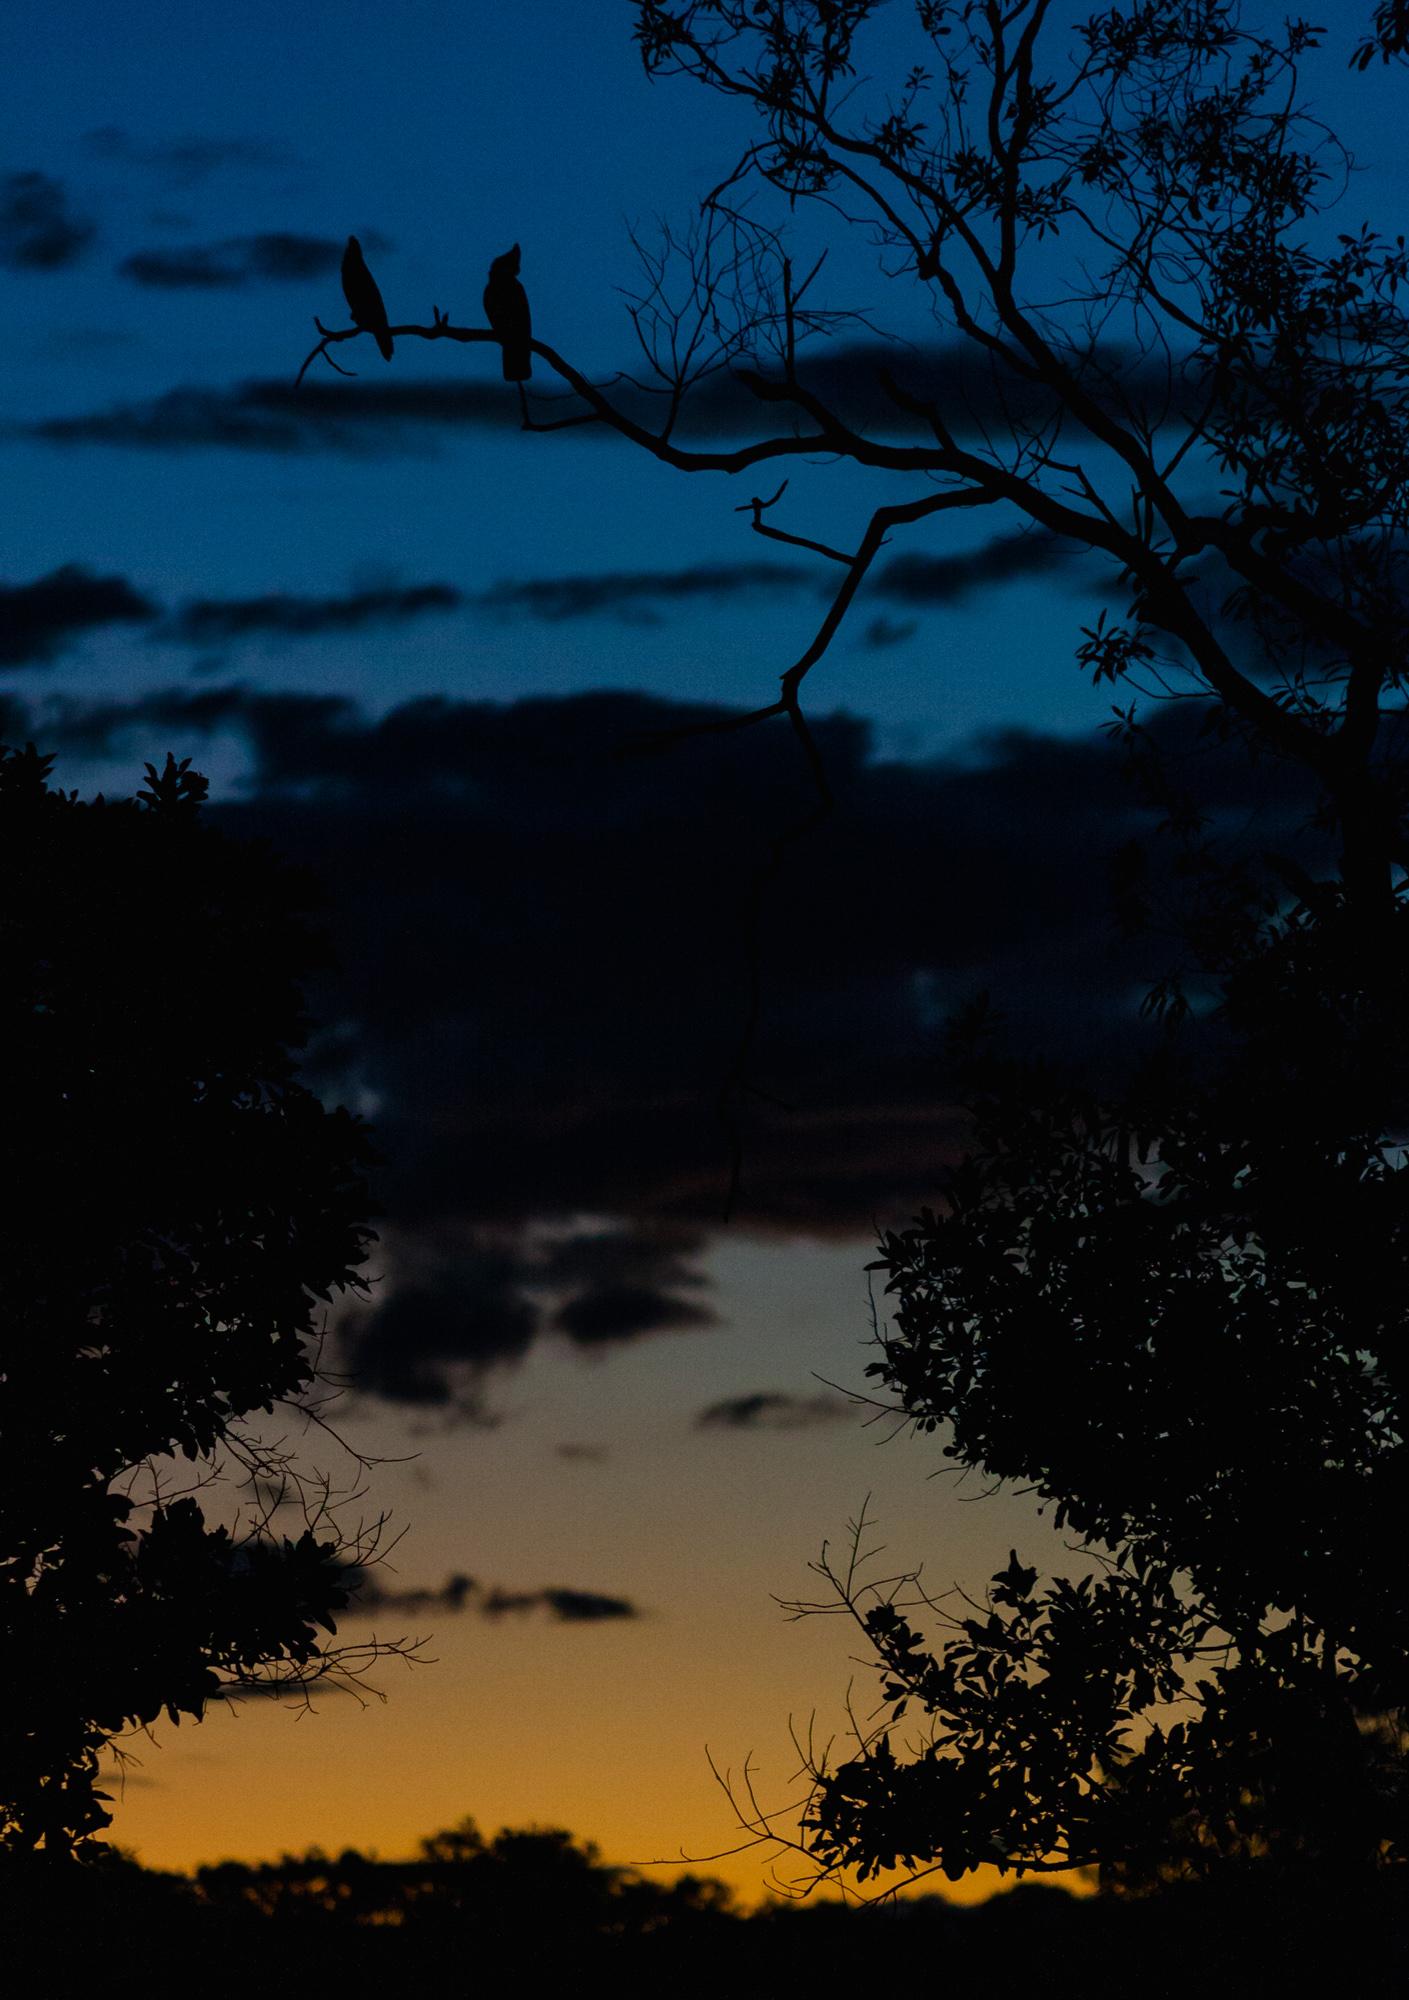 Sonnenuntergang Papageien Outback Australien